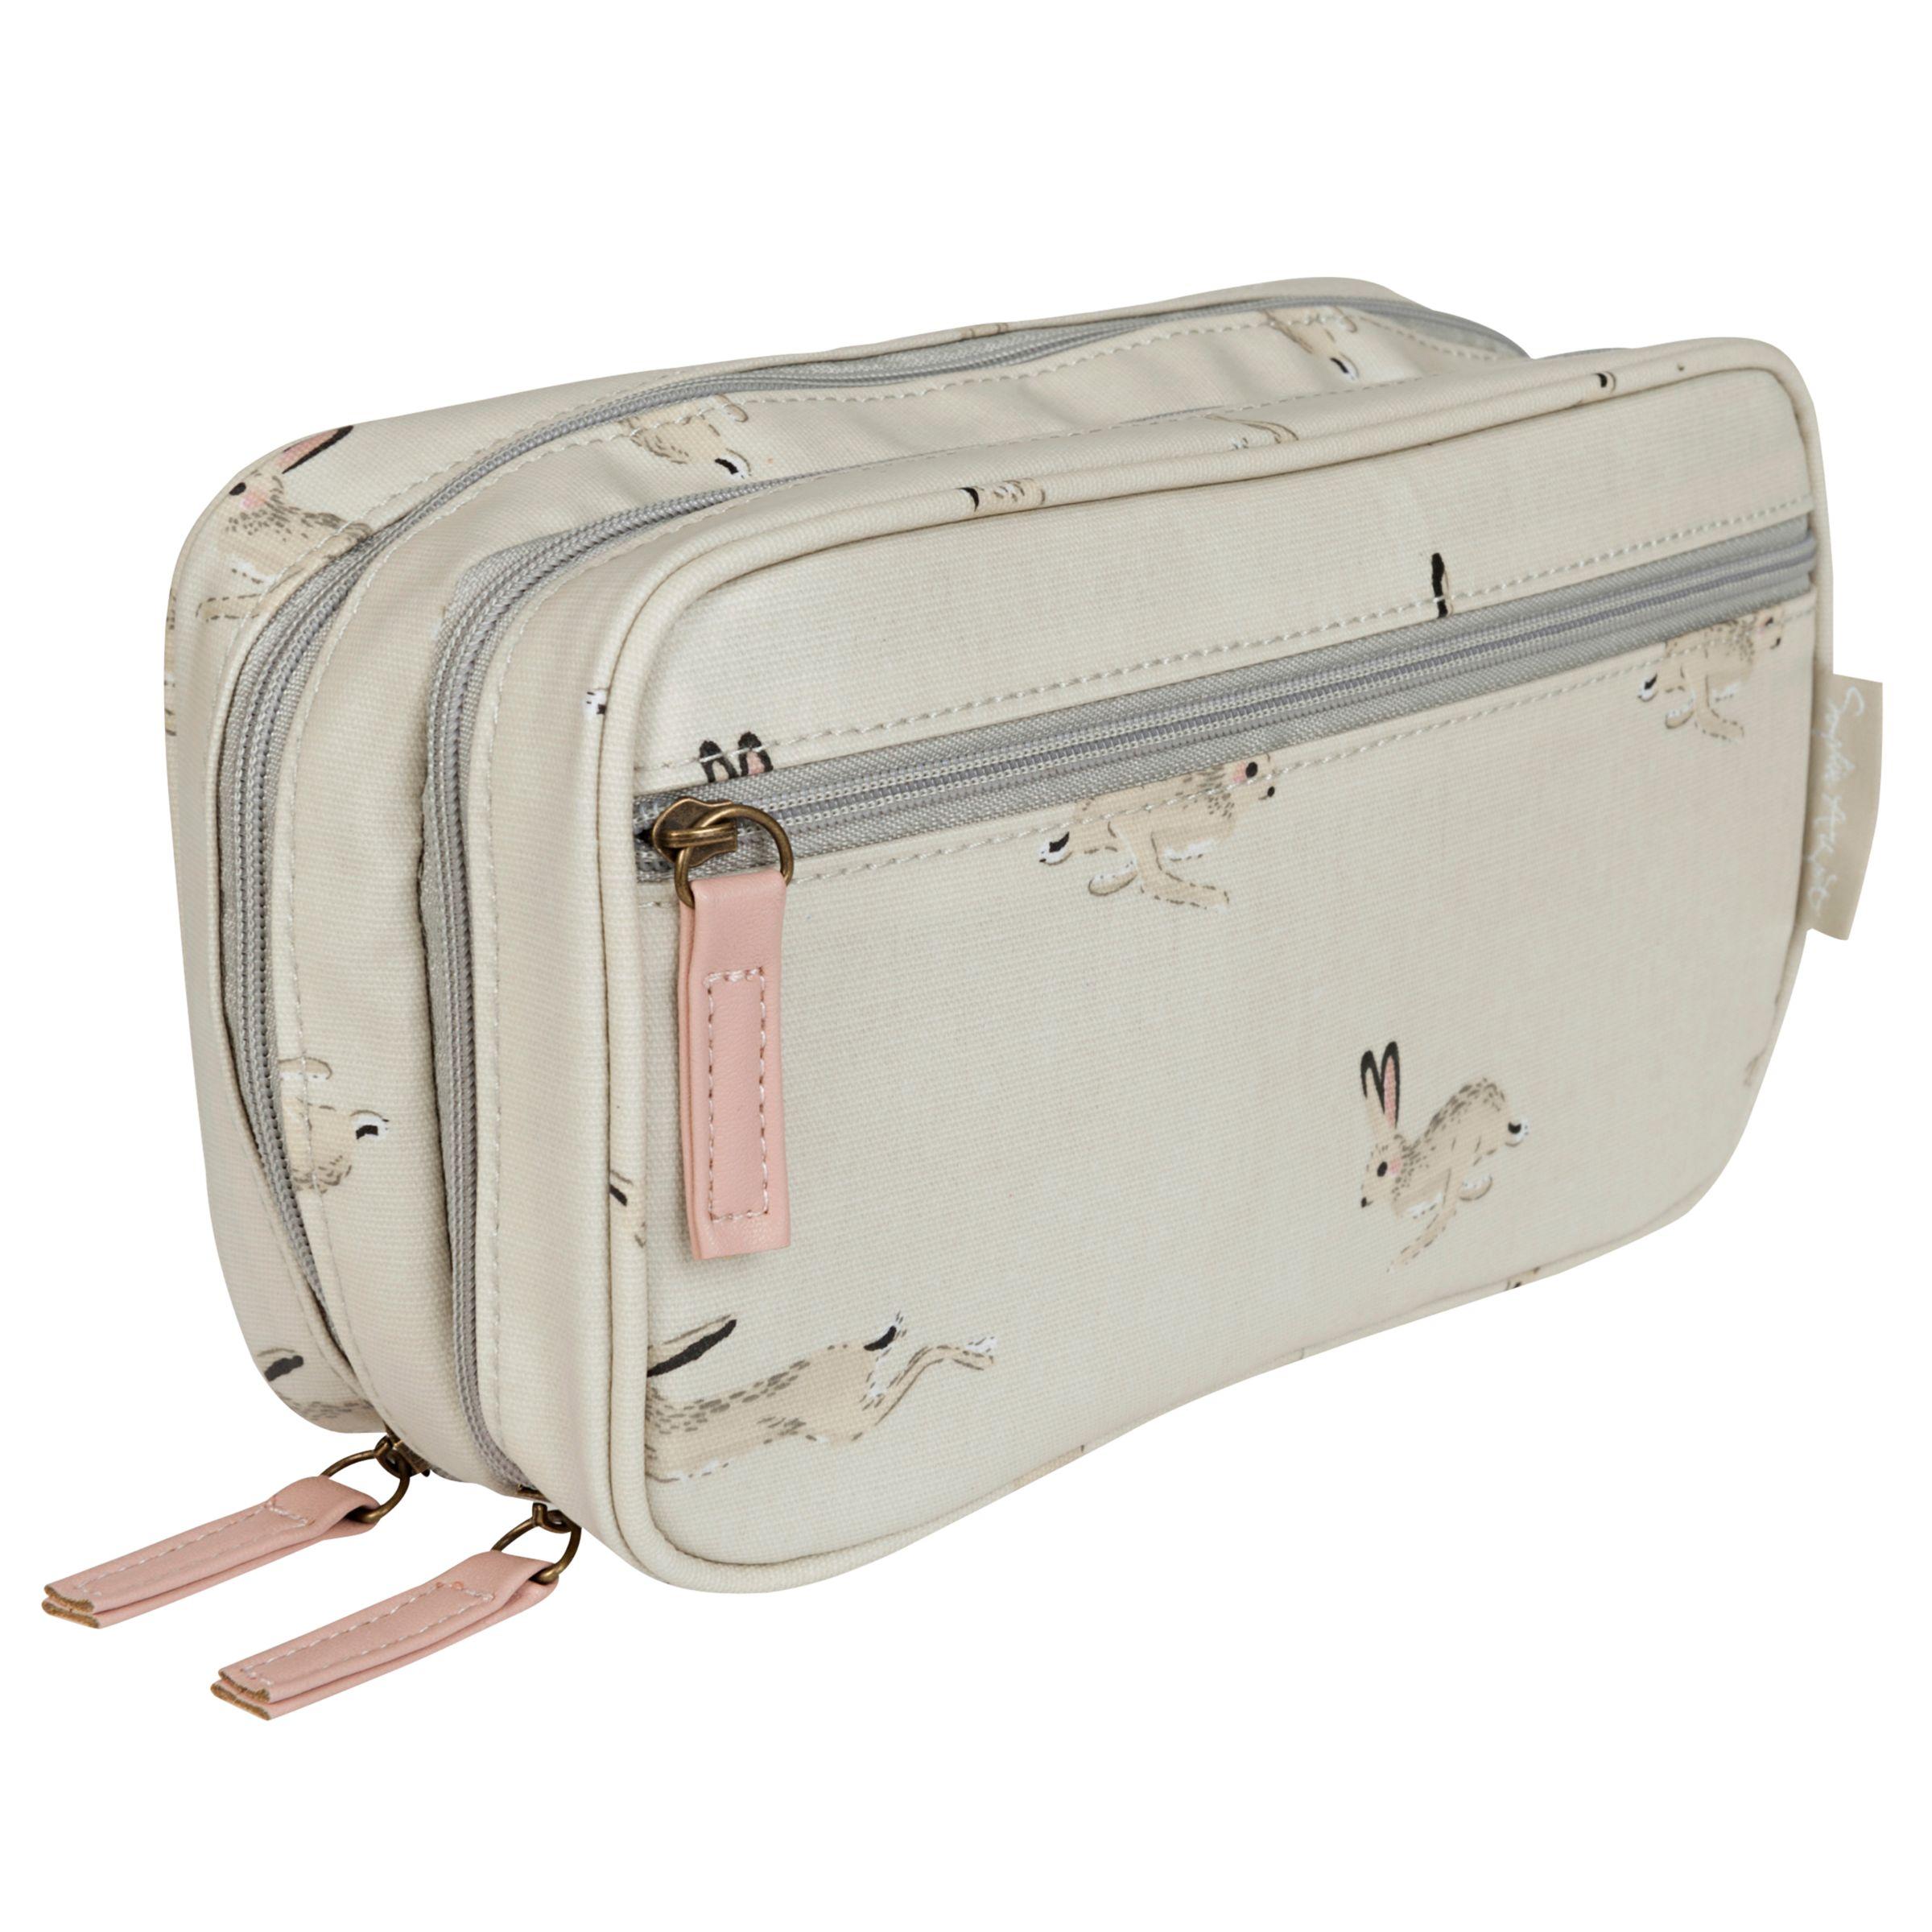 Sophie Allport Sophie Allport Hare Toiletries Bag